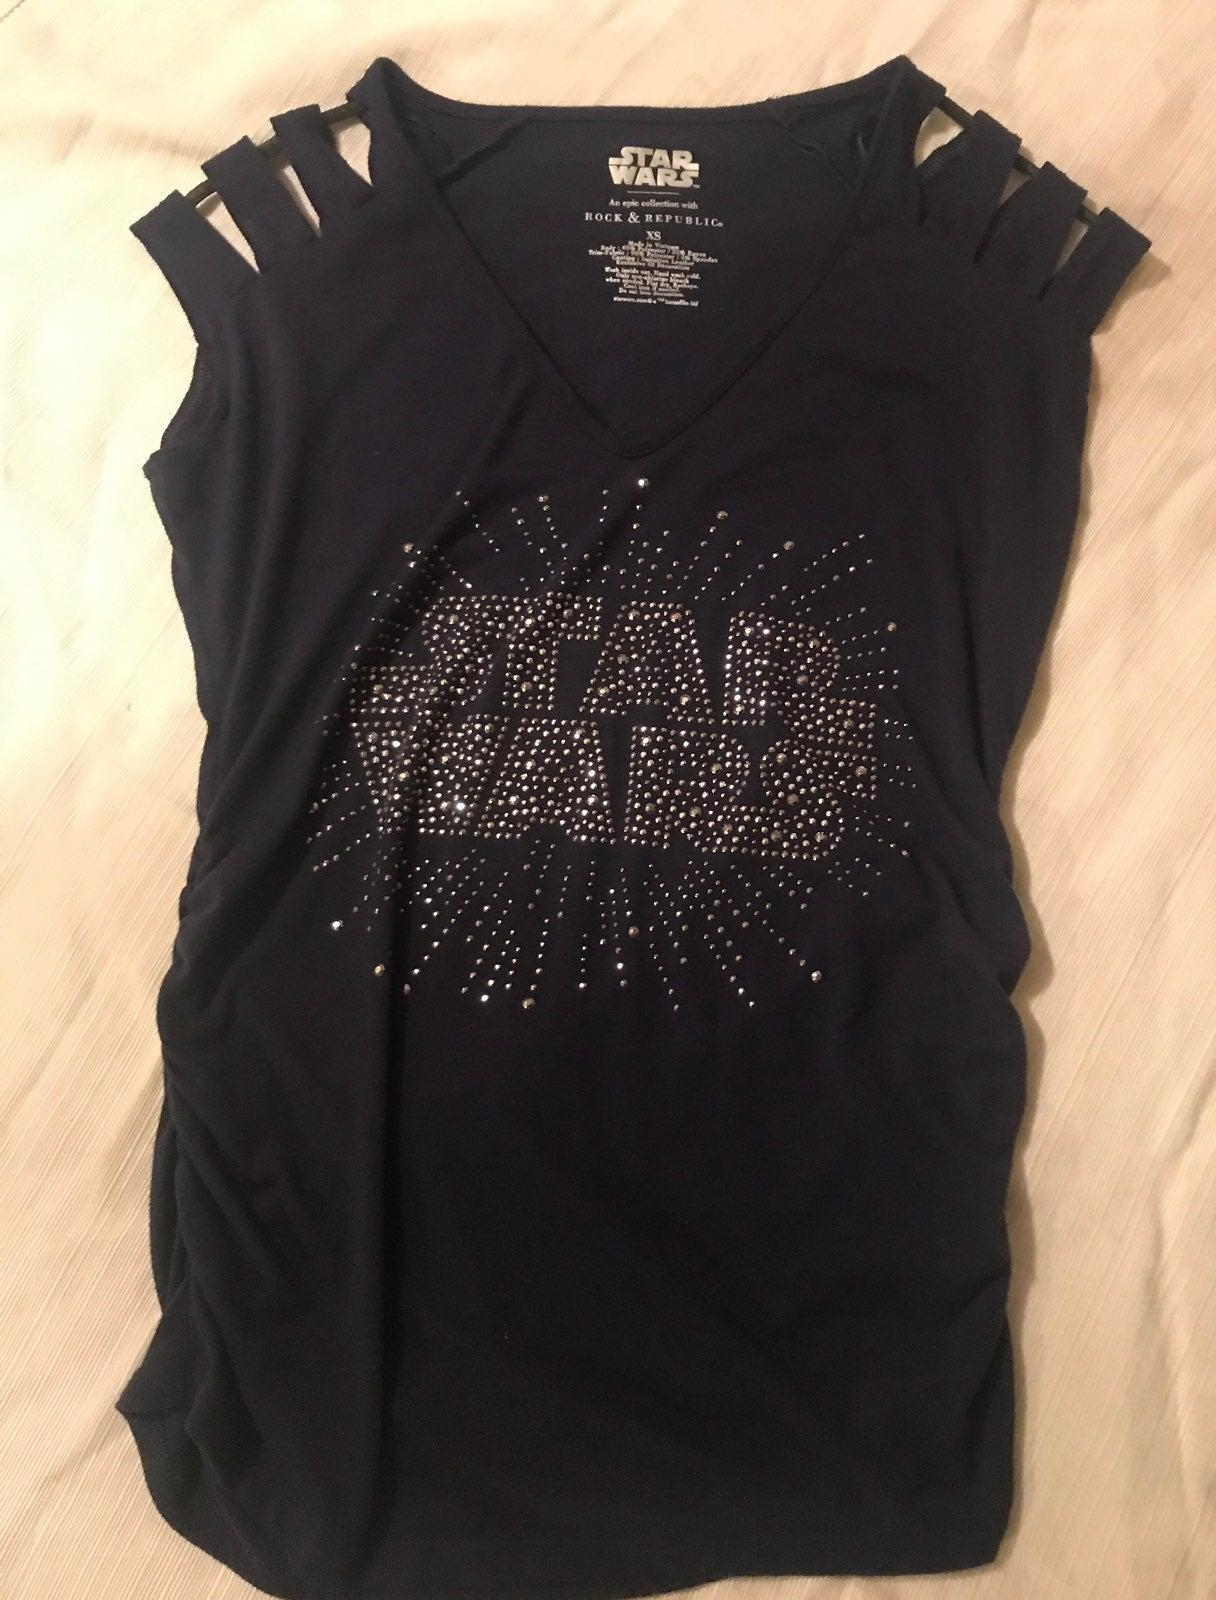 Rock & Republic Star Wars shirt